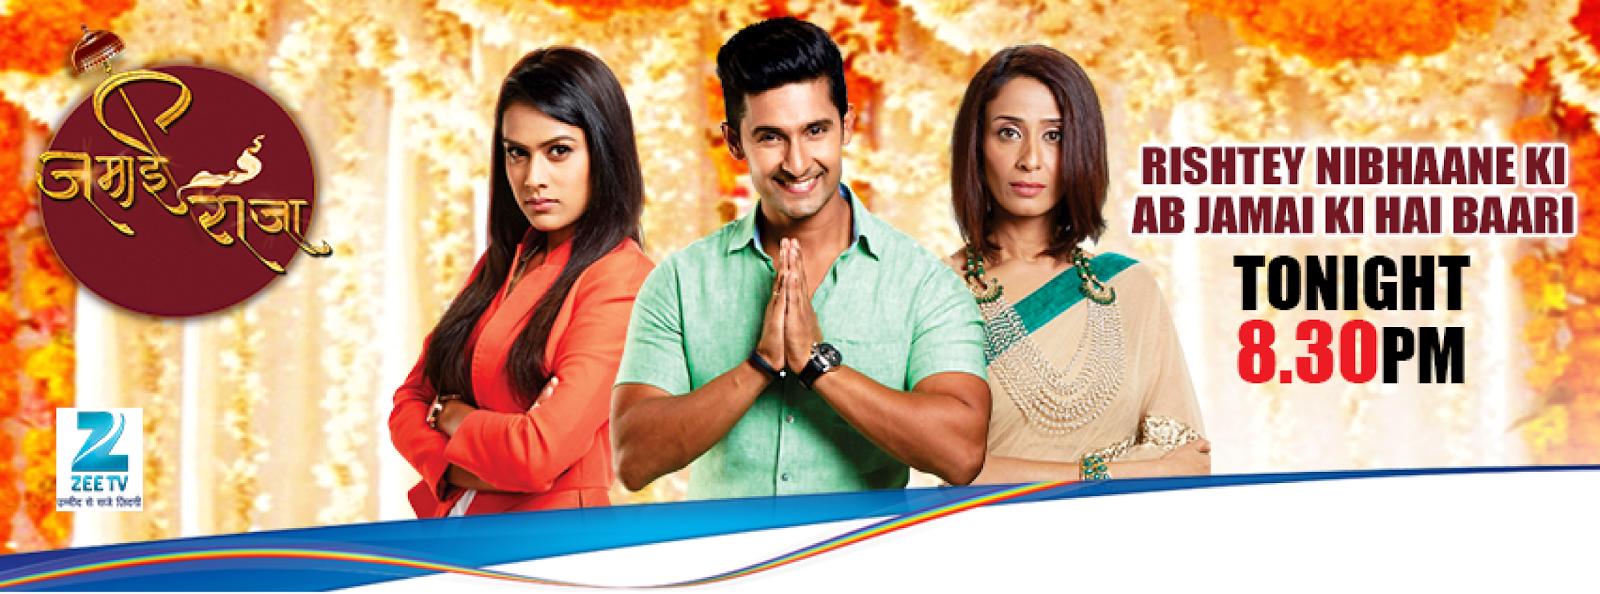 Jamai Raja 10th October 2014 Full Episode Watch Online